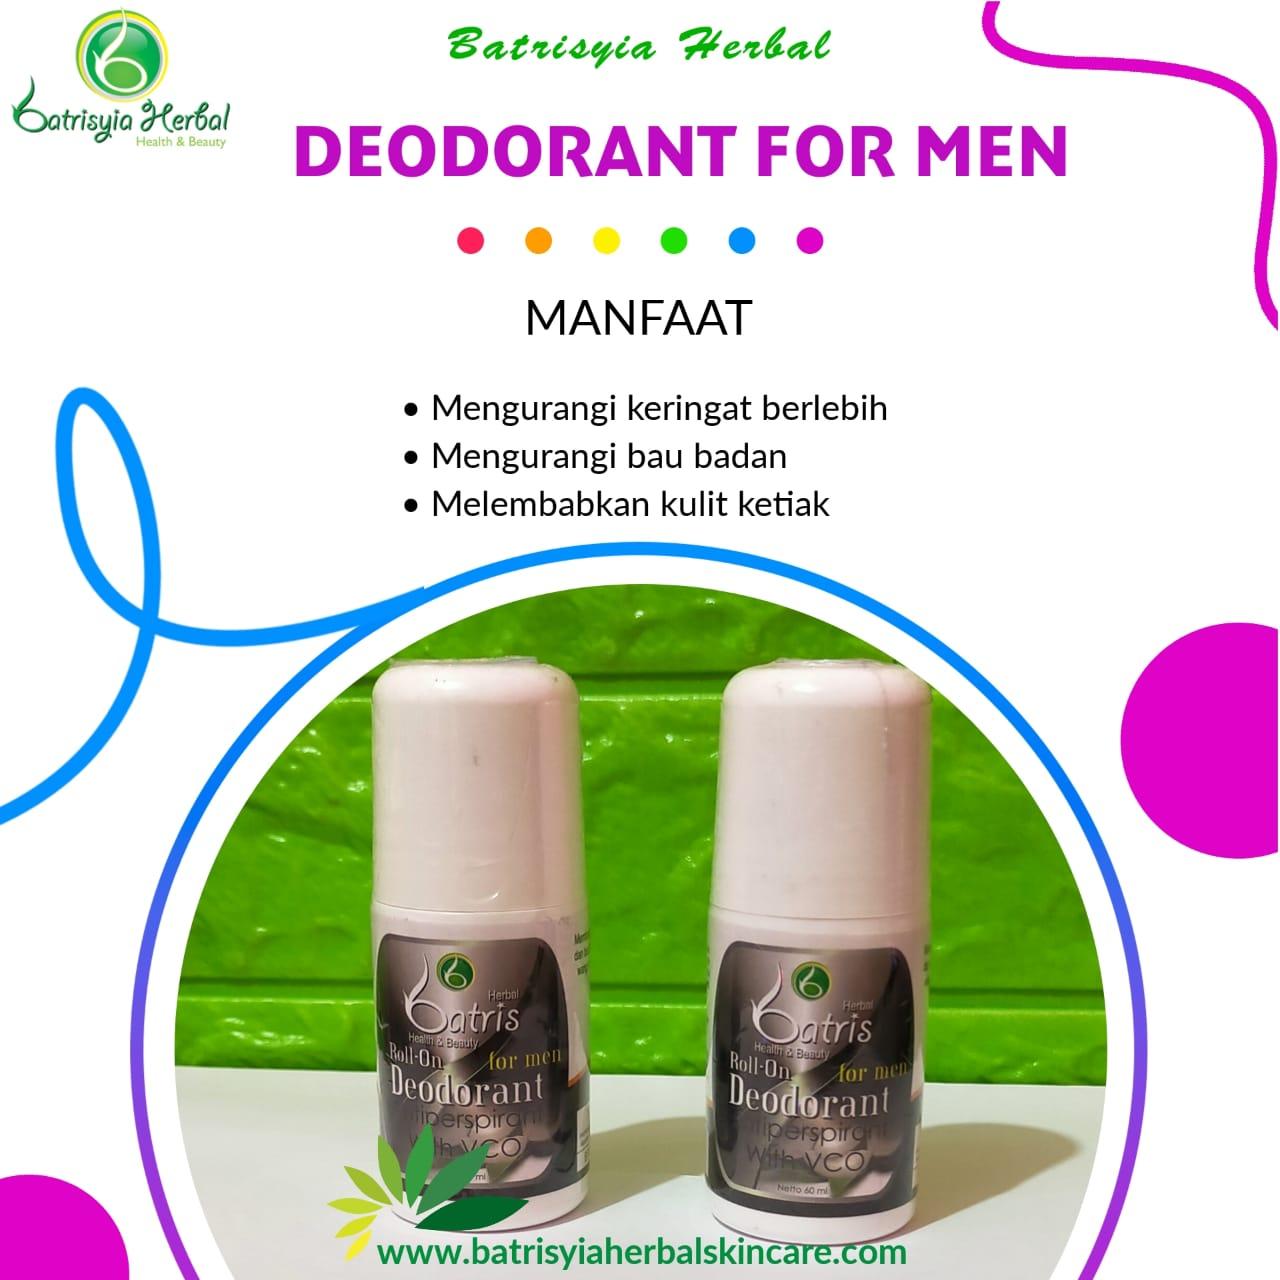 Roll-On Deodorant for Men Batrisyia